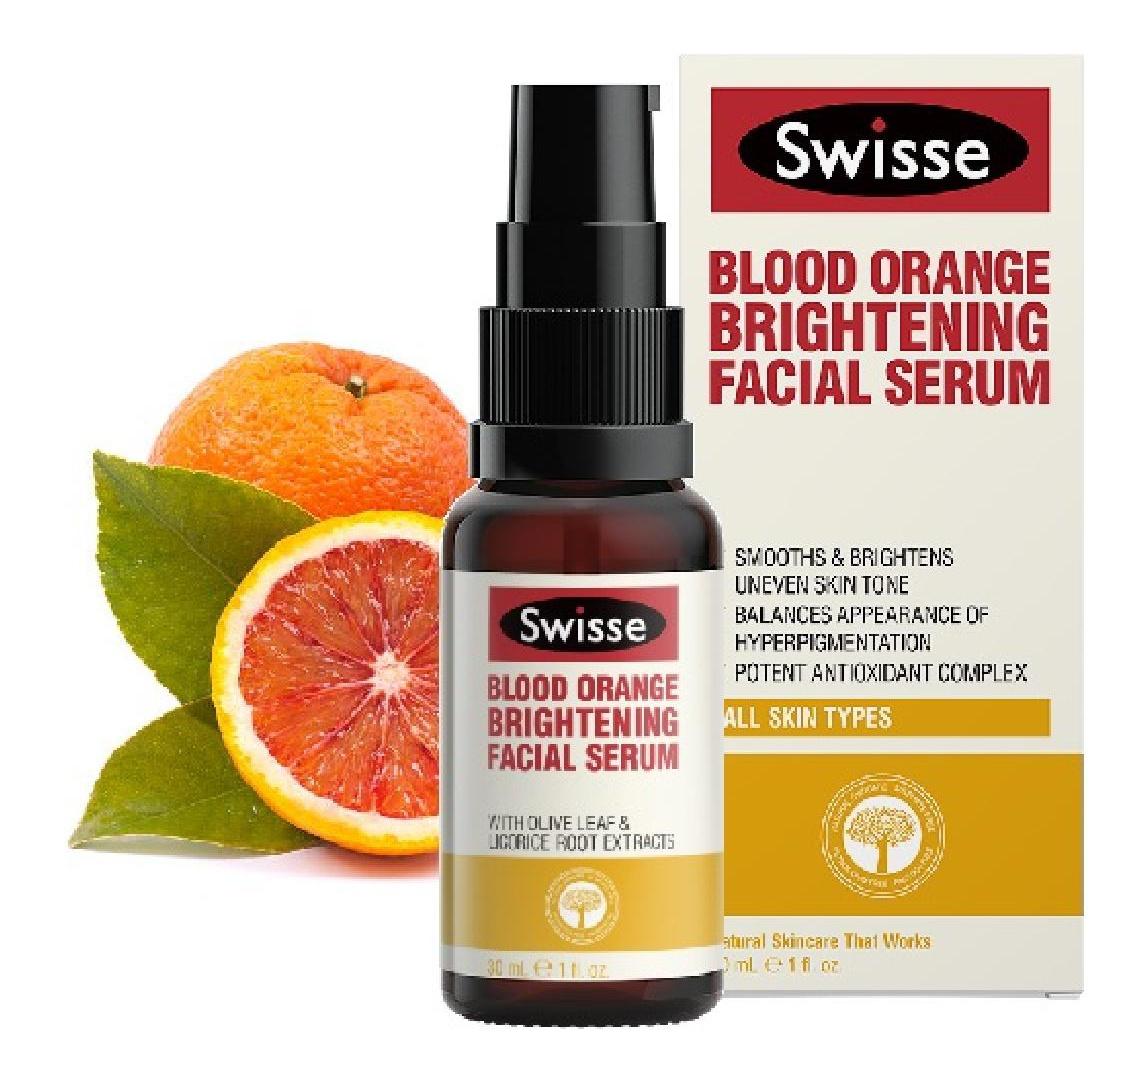 Swisse Blood Orange Brightening Facial Serum